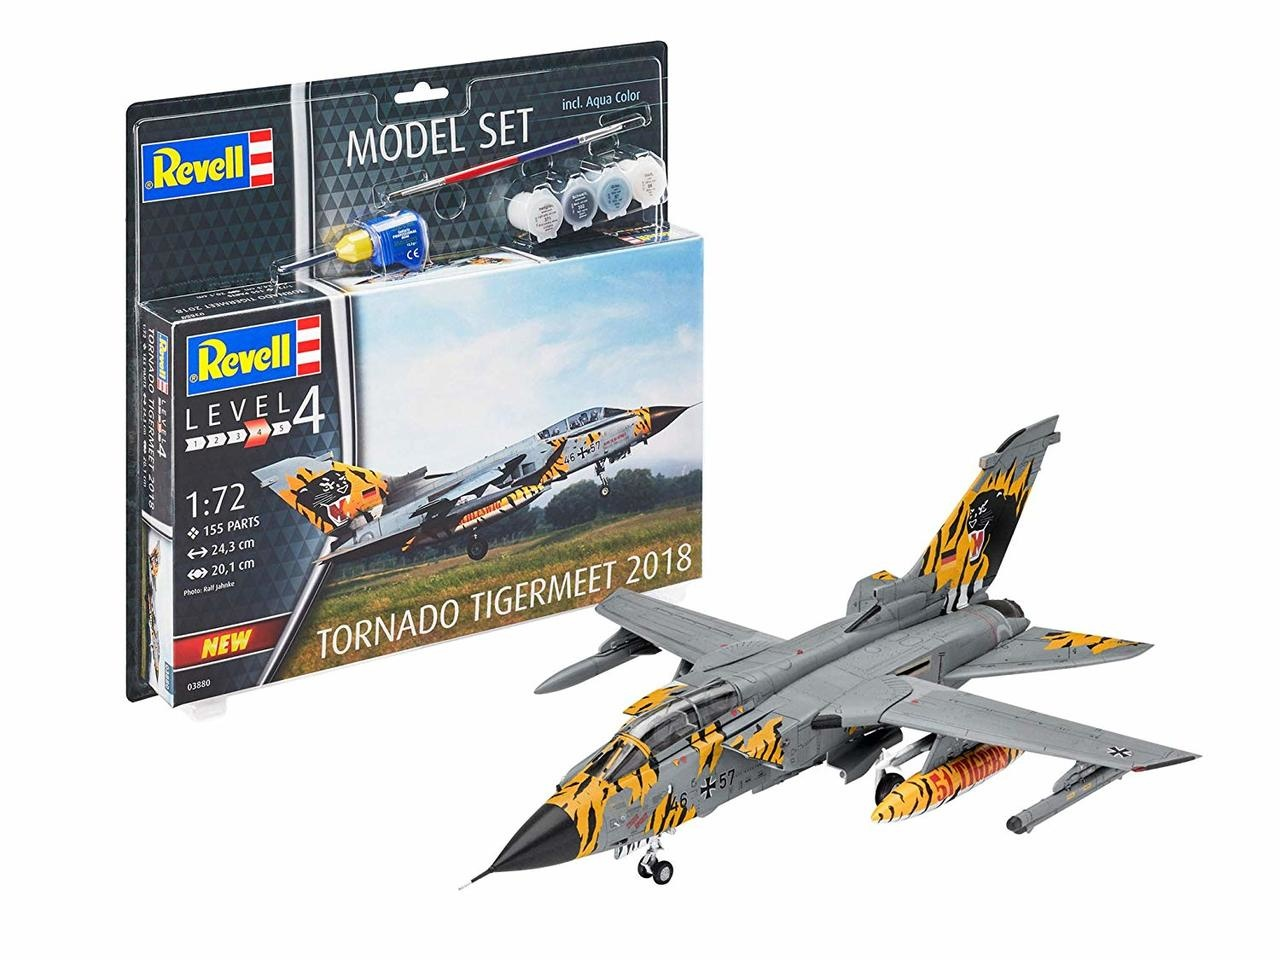 Model-set tornado tigermeet 18